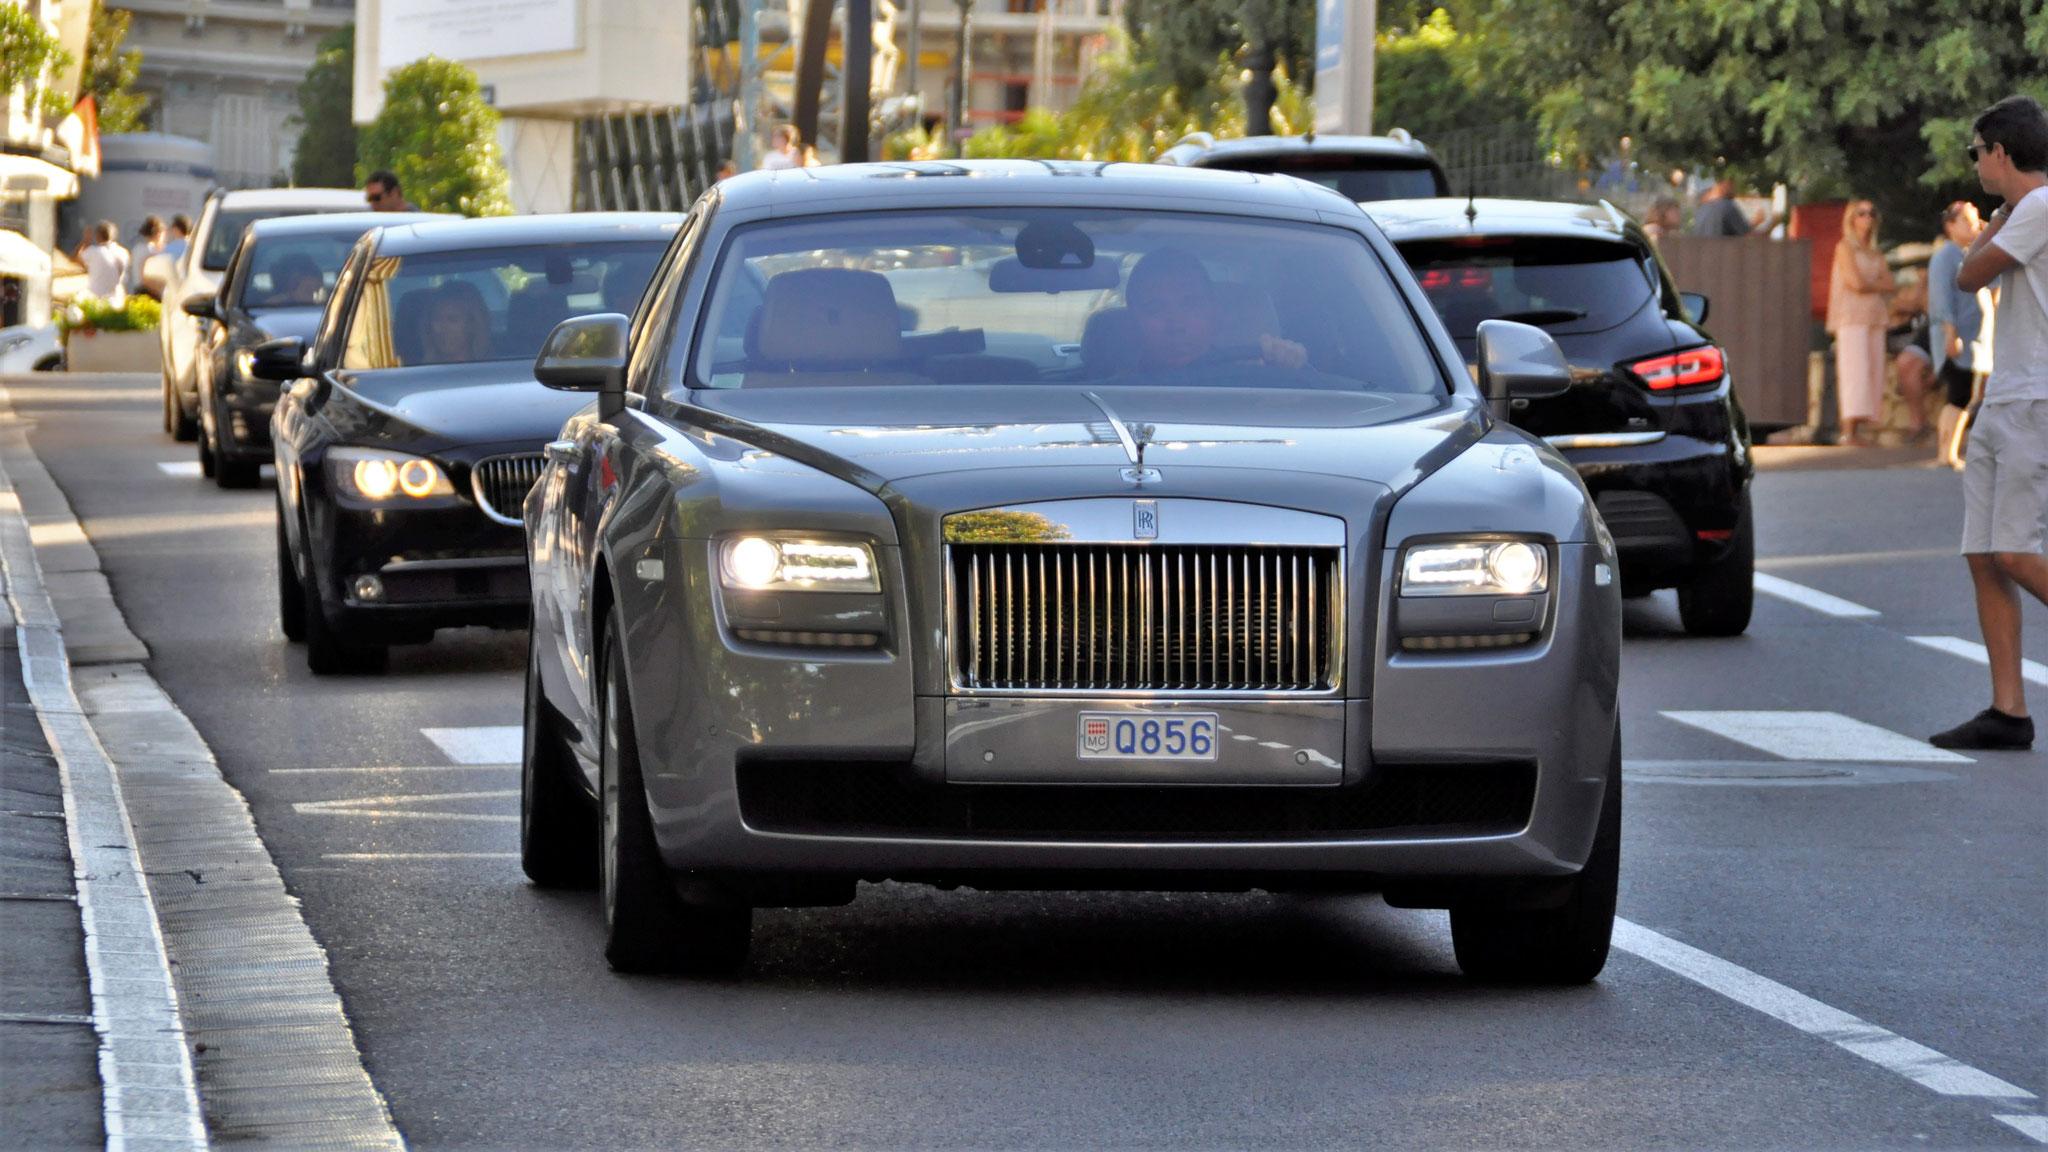 Rolls Royce Ghost - Q856 (MC)